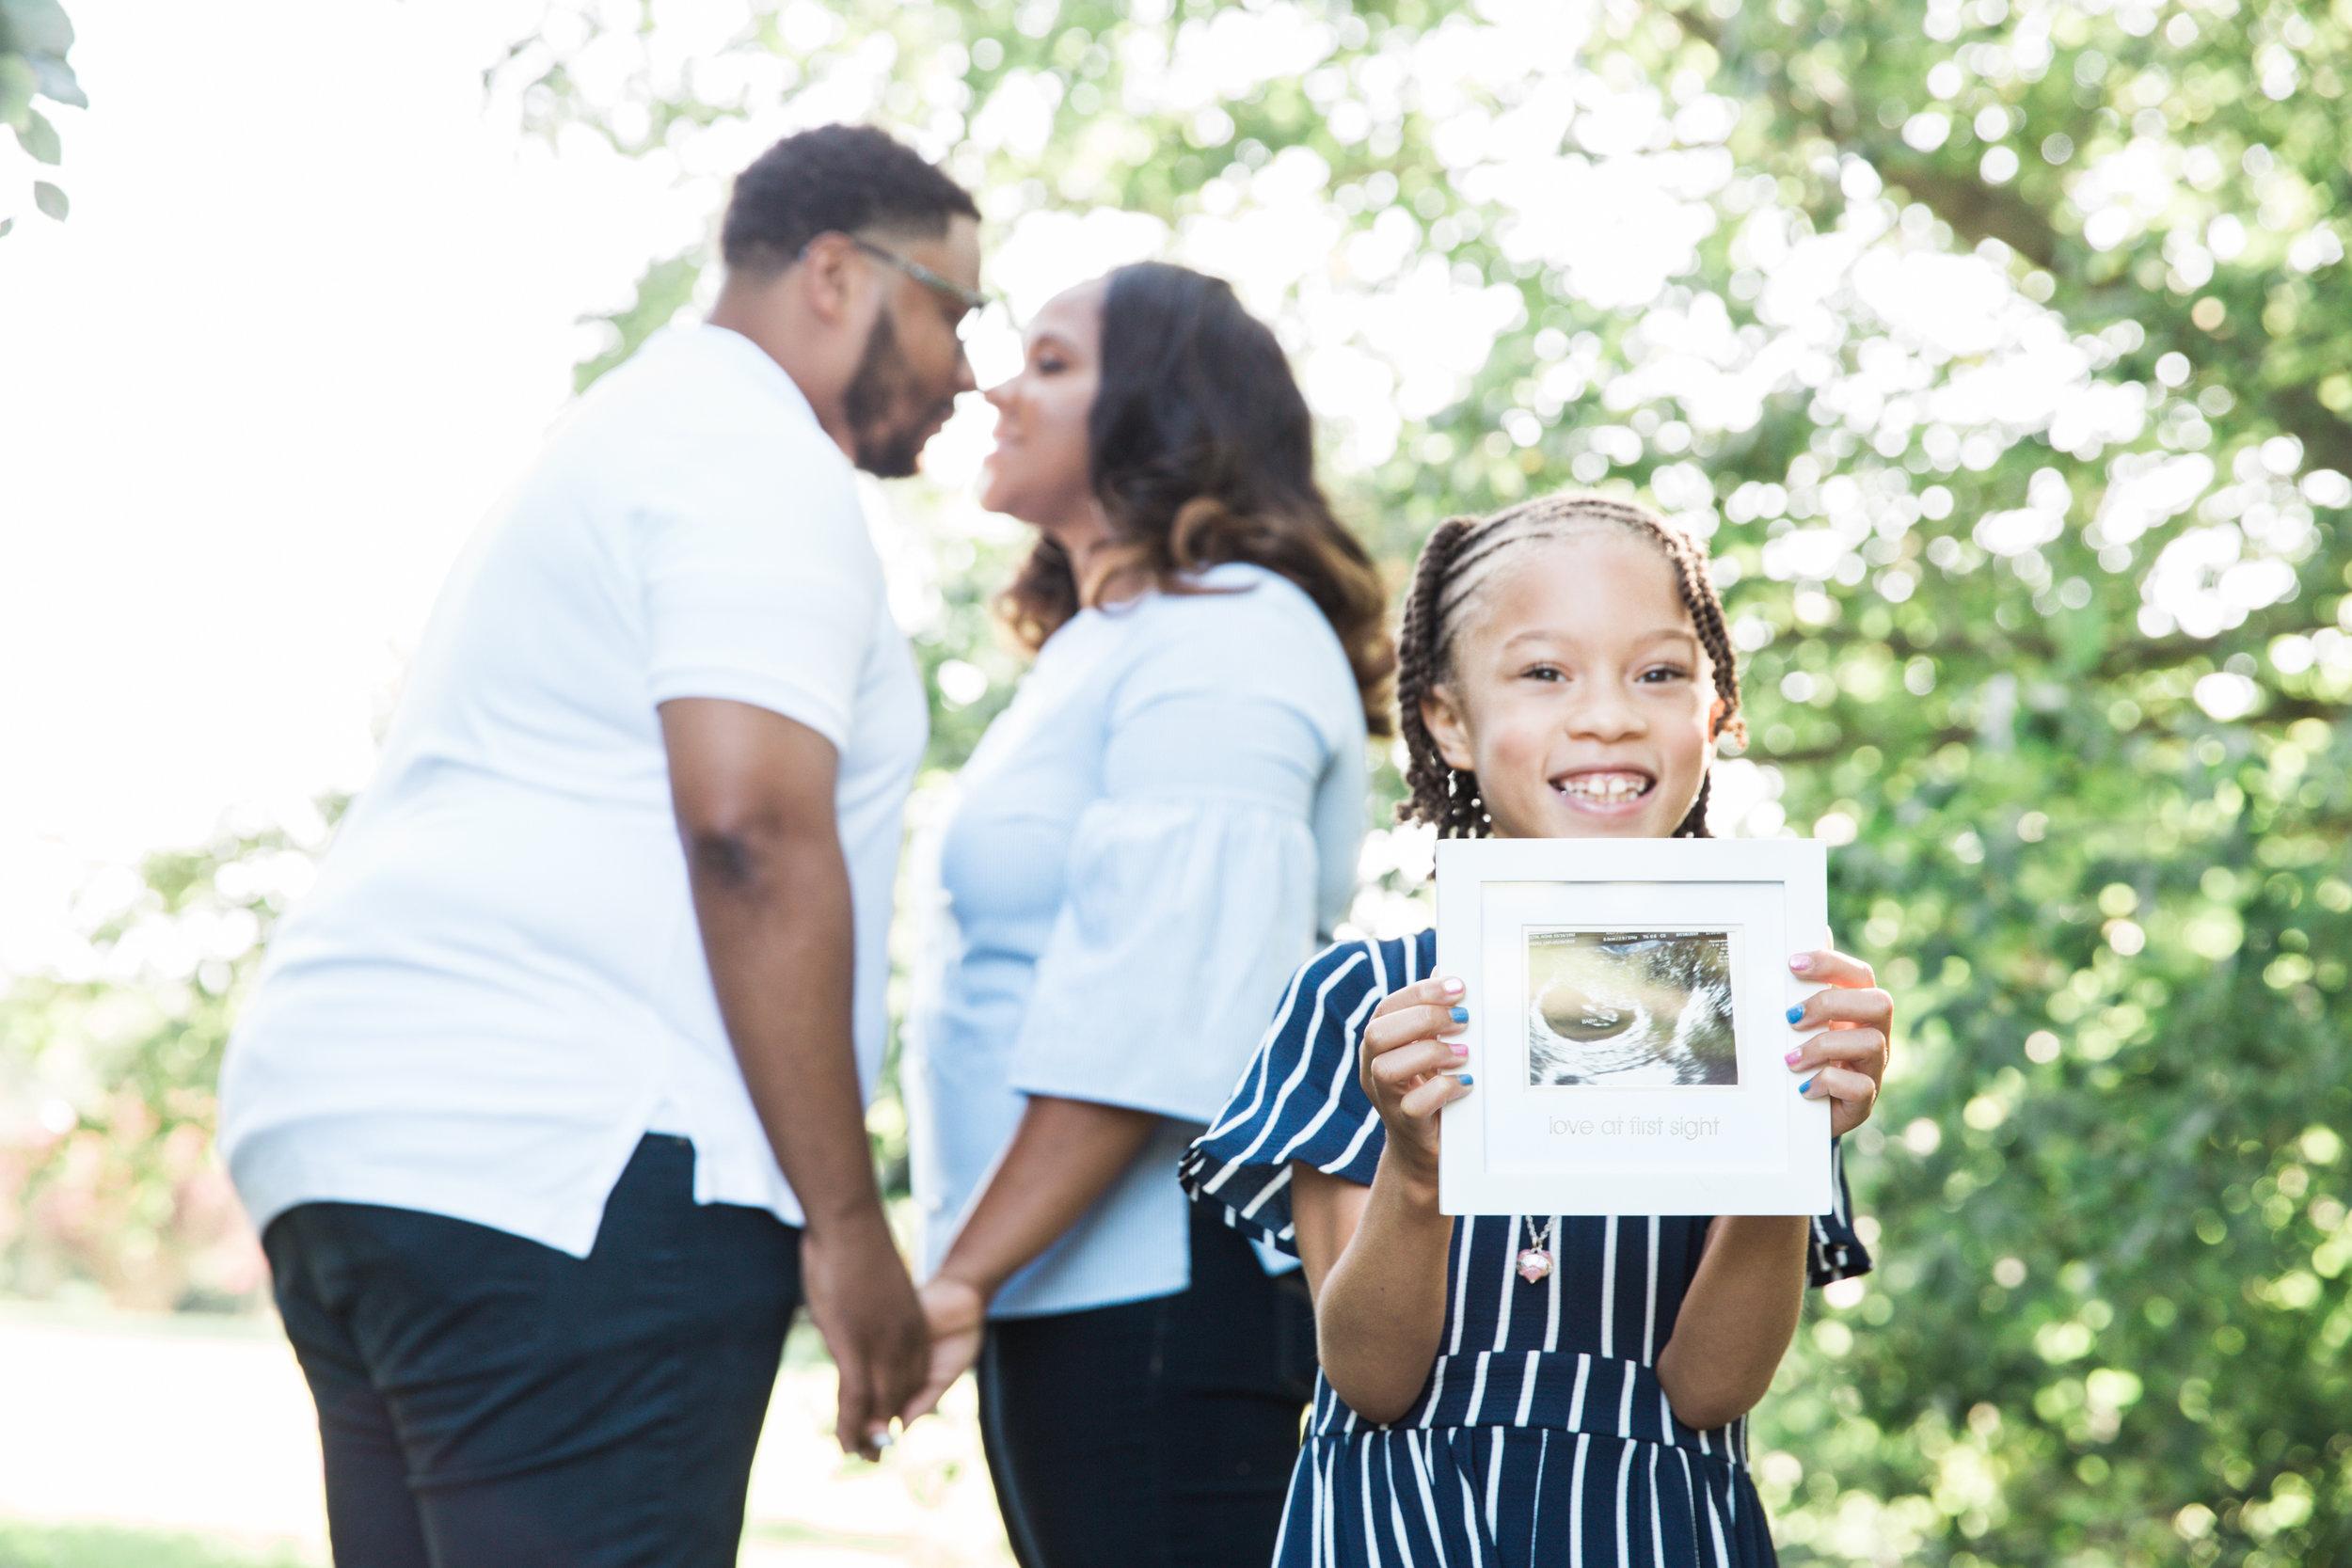 Baltimore Creative Pregnancy Announcement at Cylburn Arboretum Baltimore Family Photographer Megapixels Media Photography -7.jpg